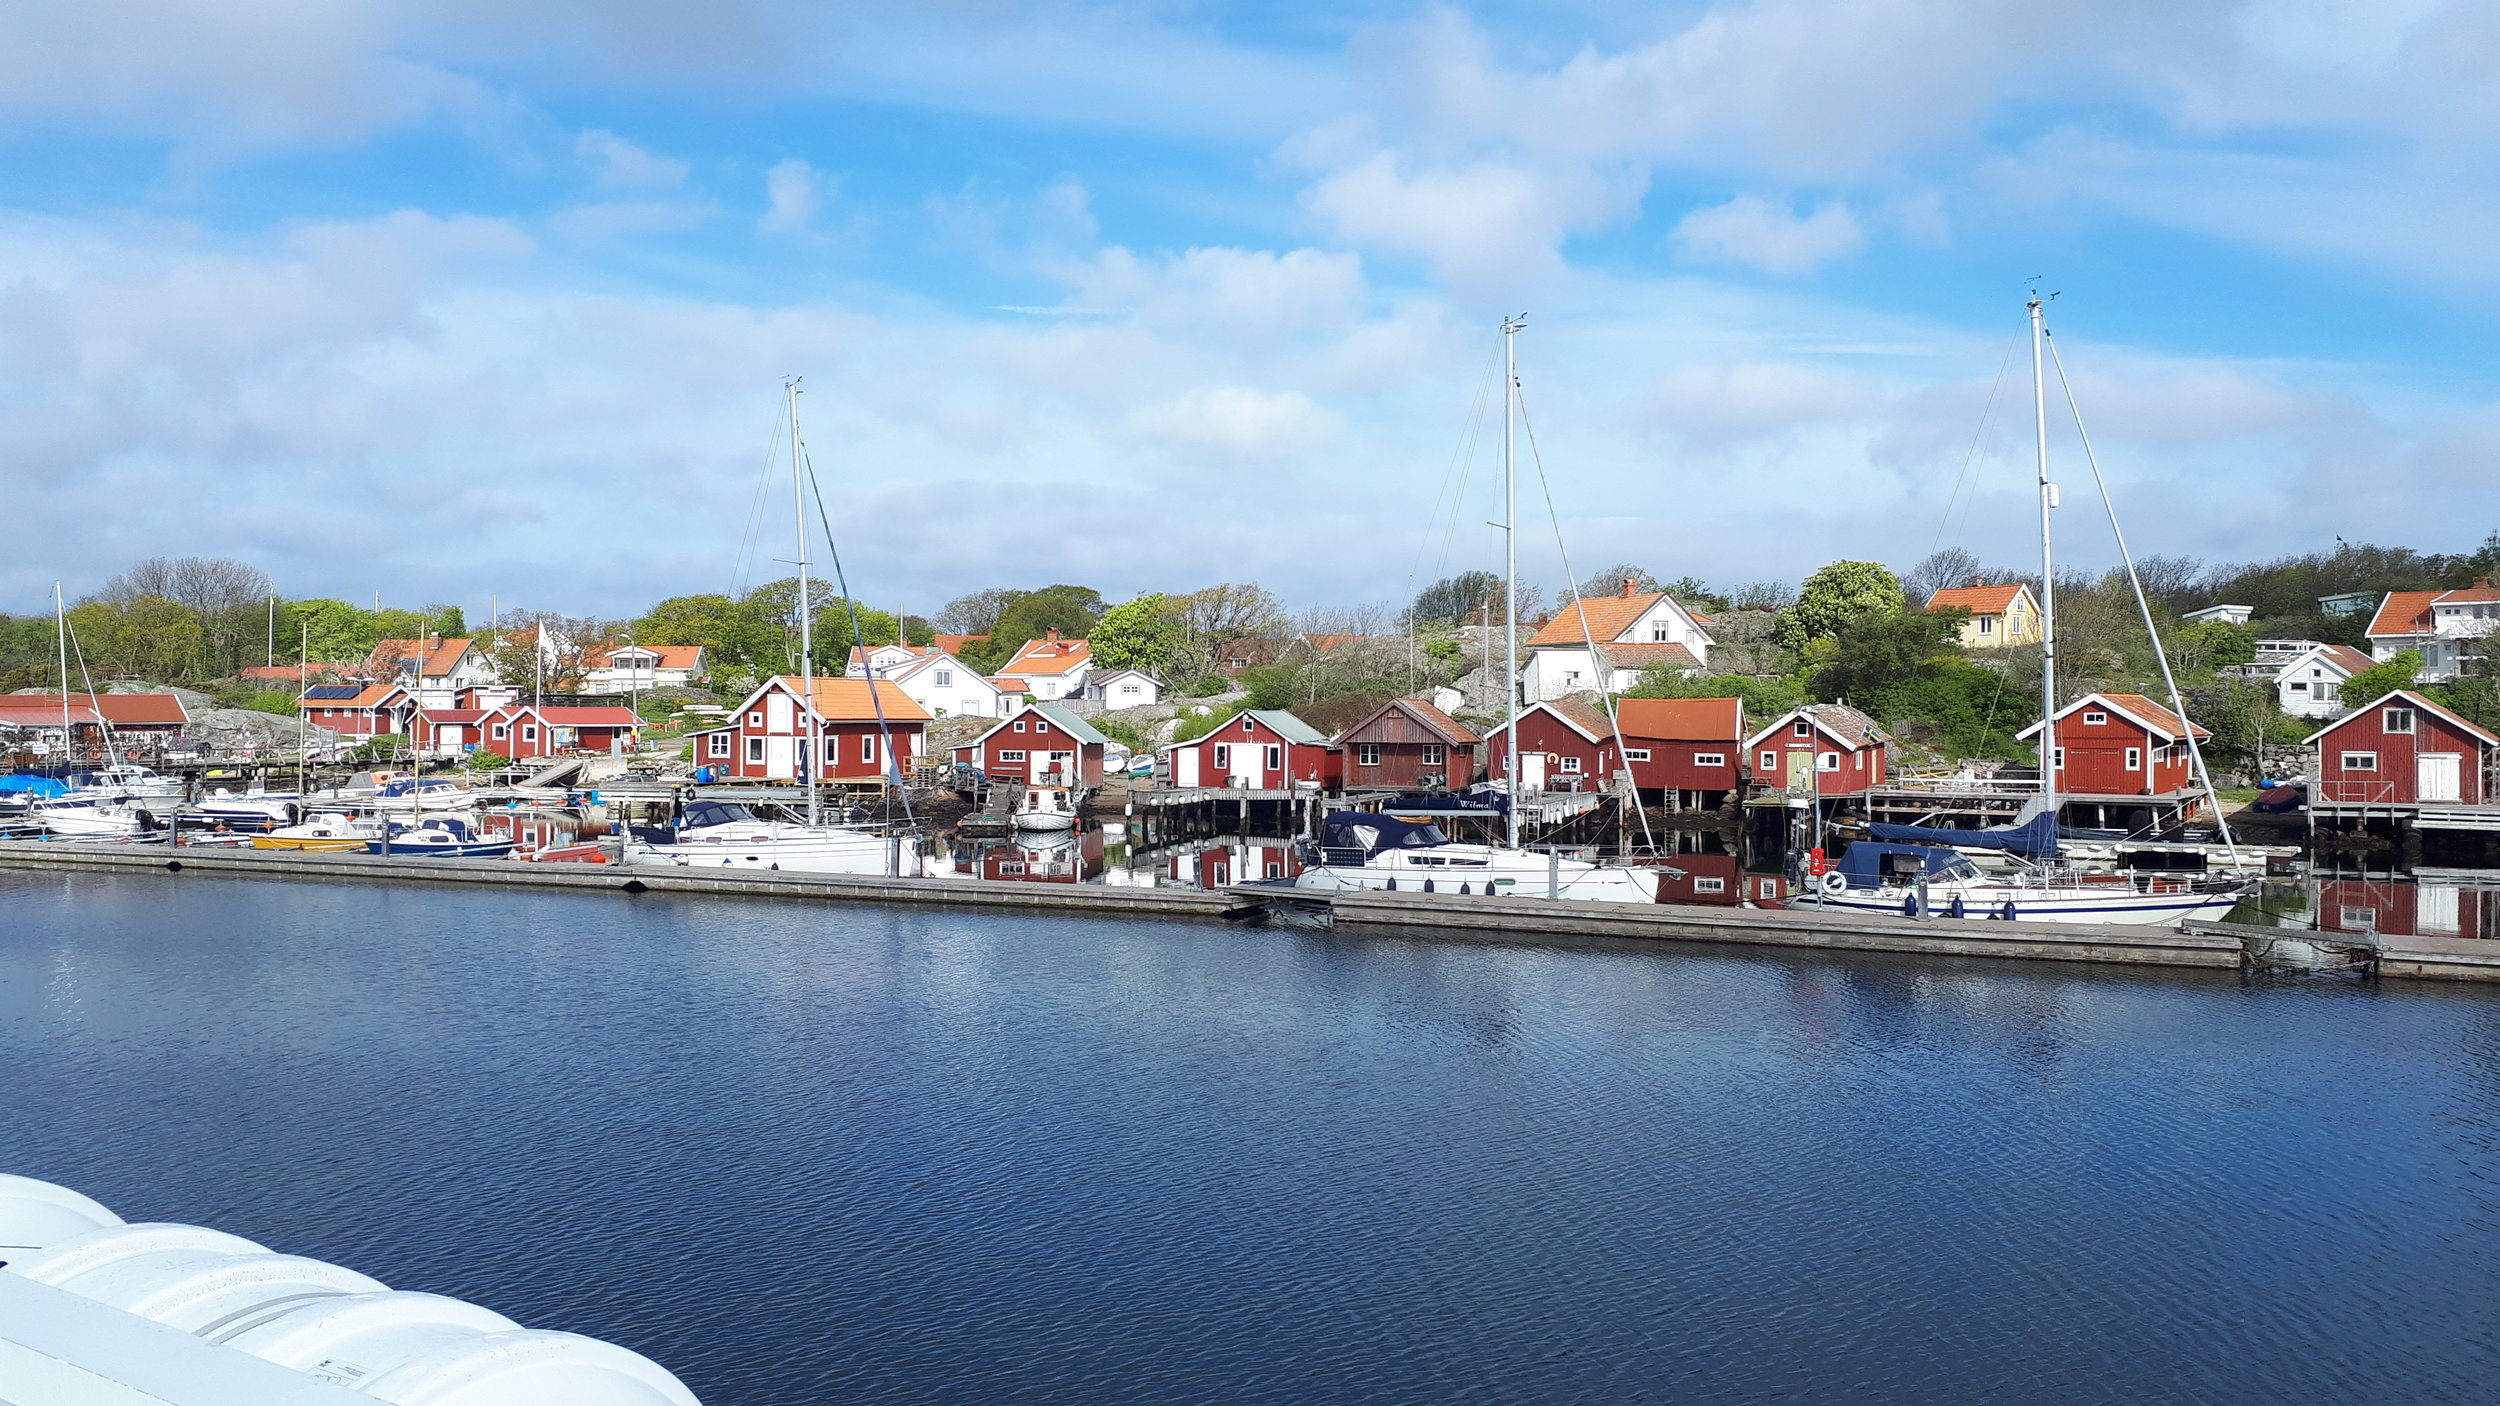 L'isola di Koster (Svezia)